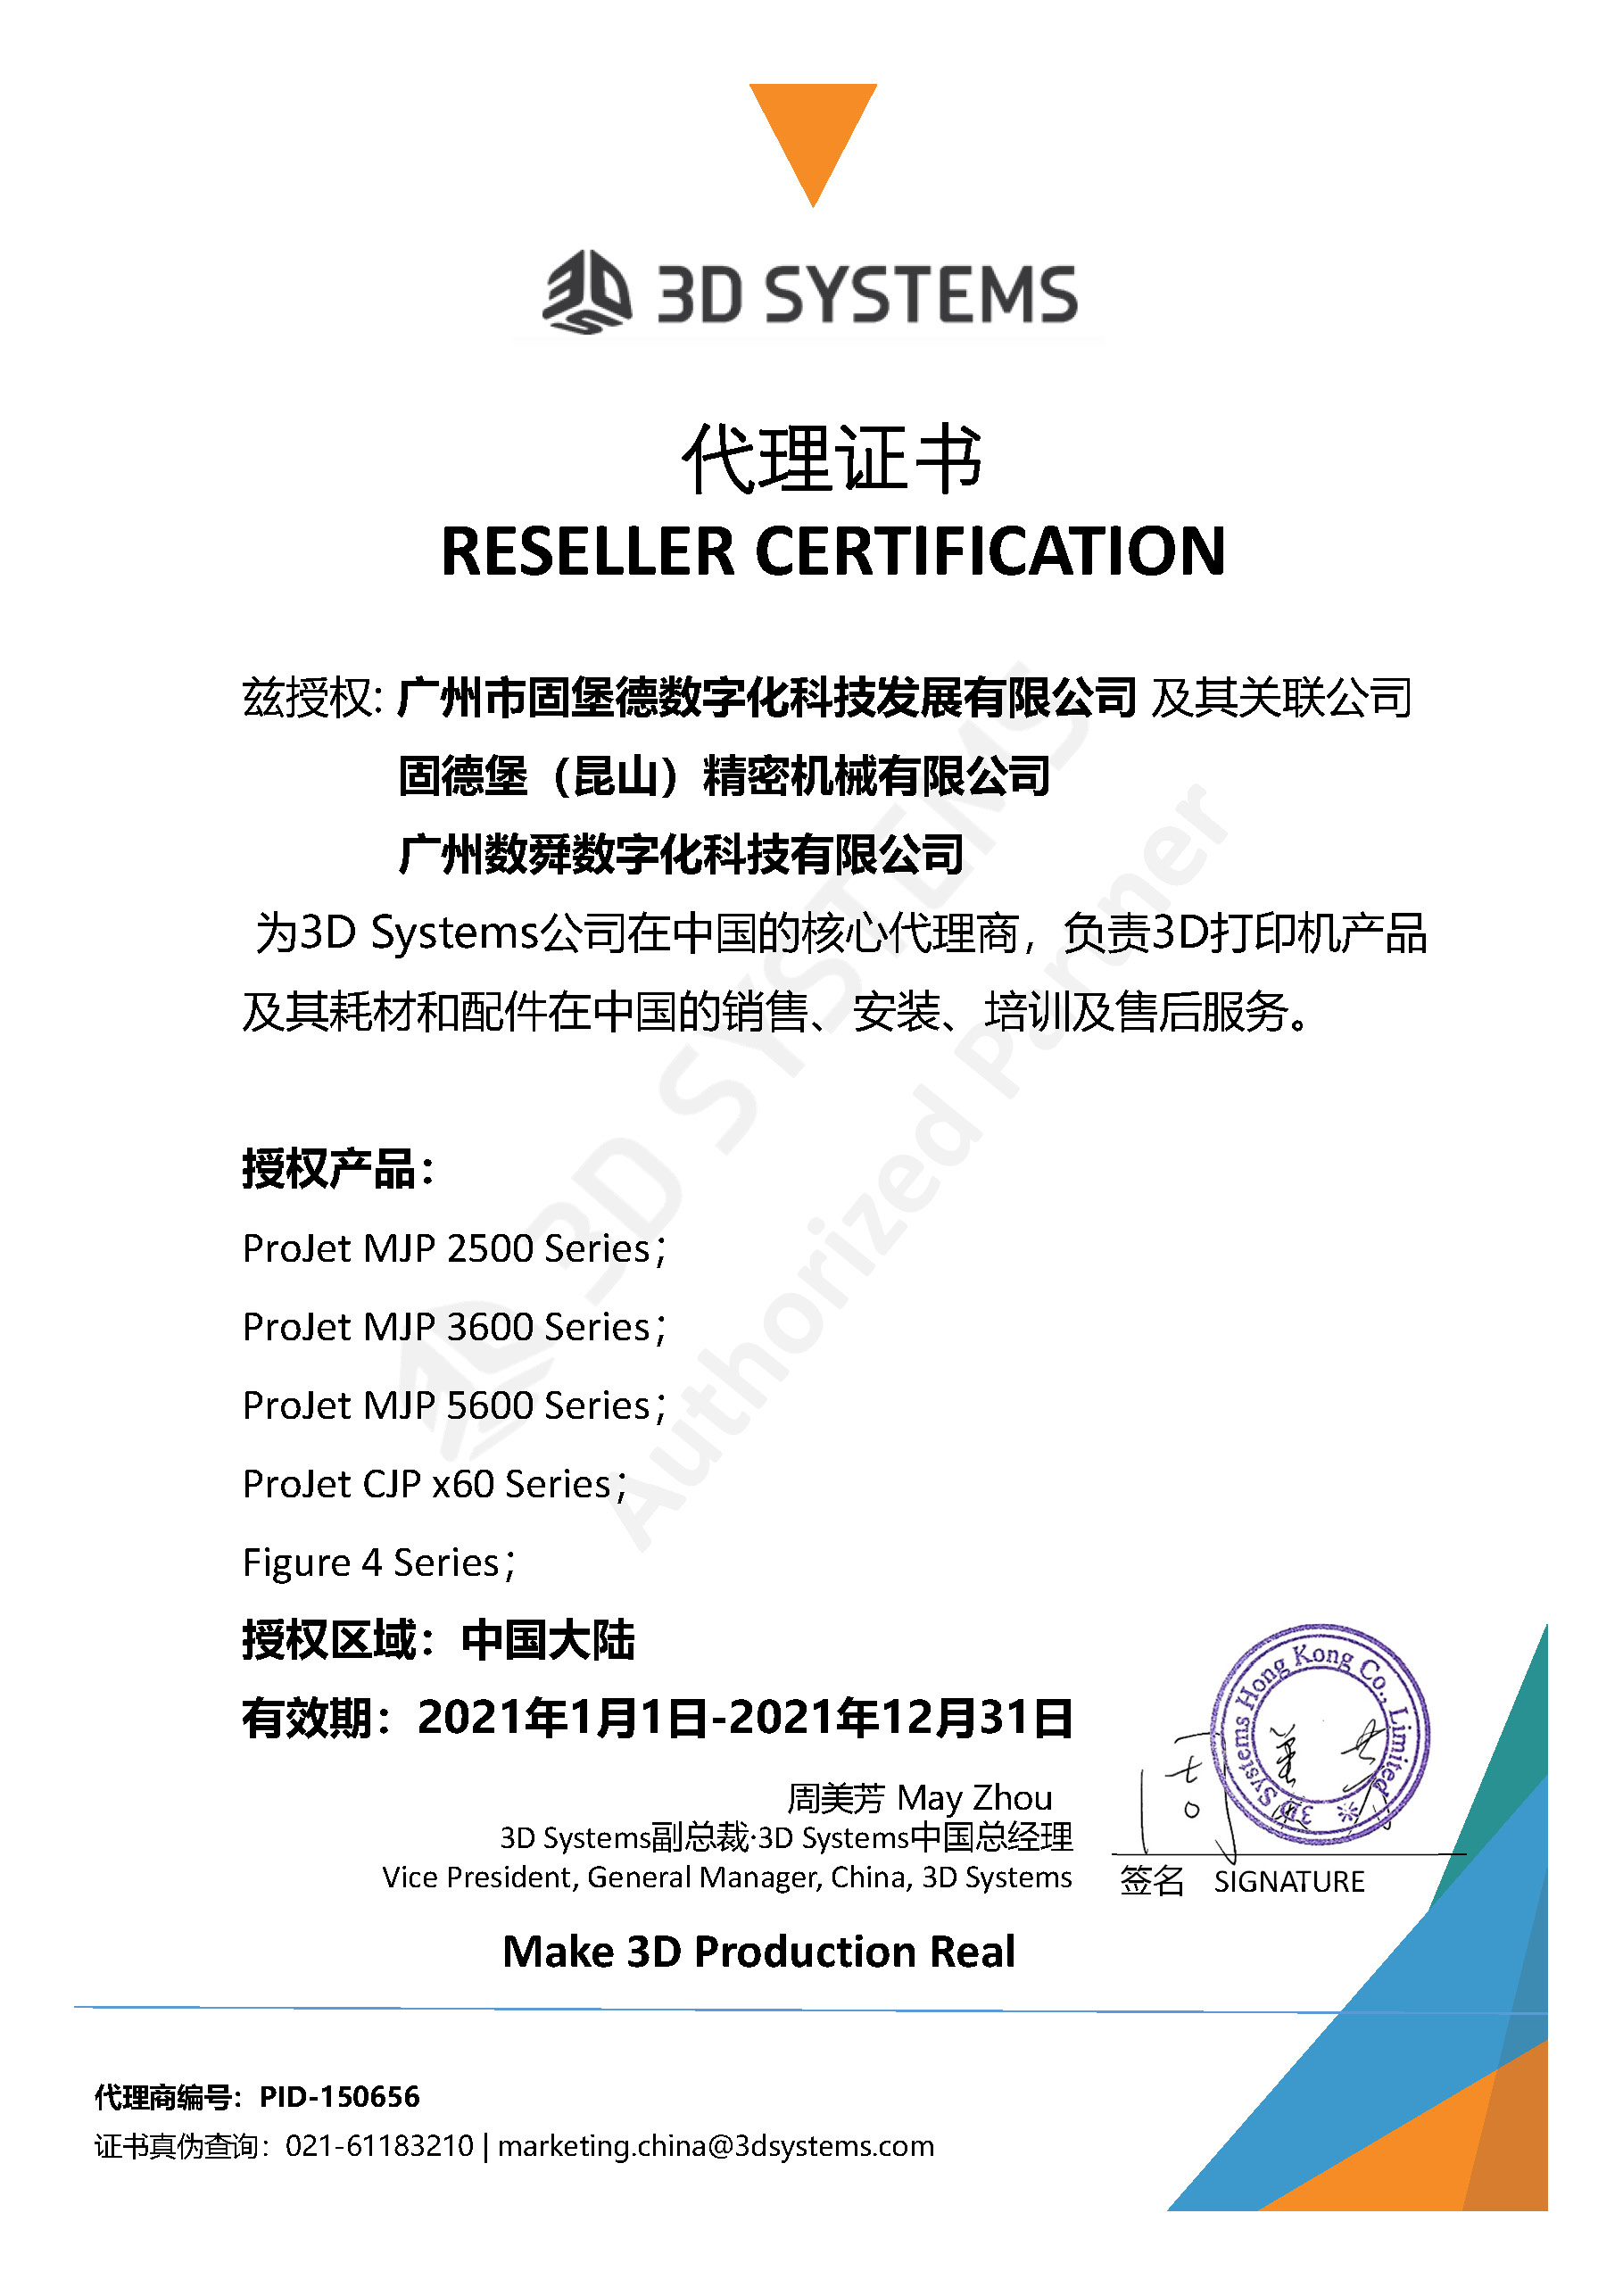 <span>2021年版-MR授权证书</span>